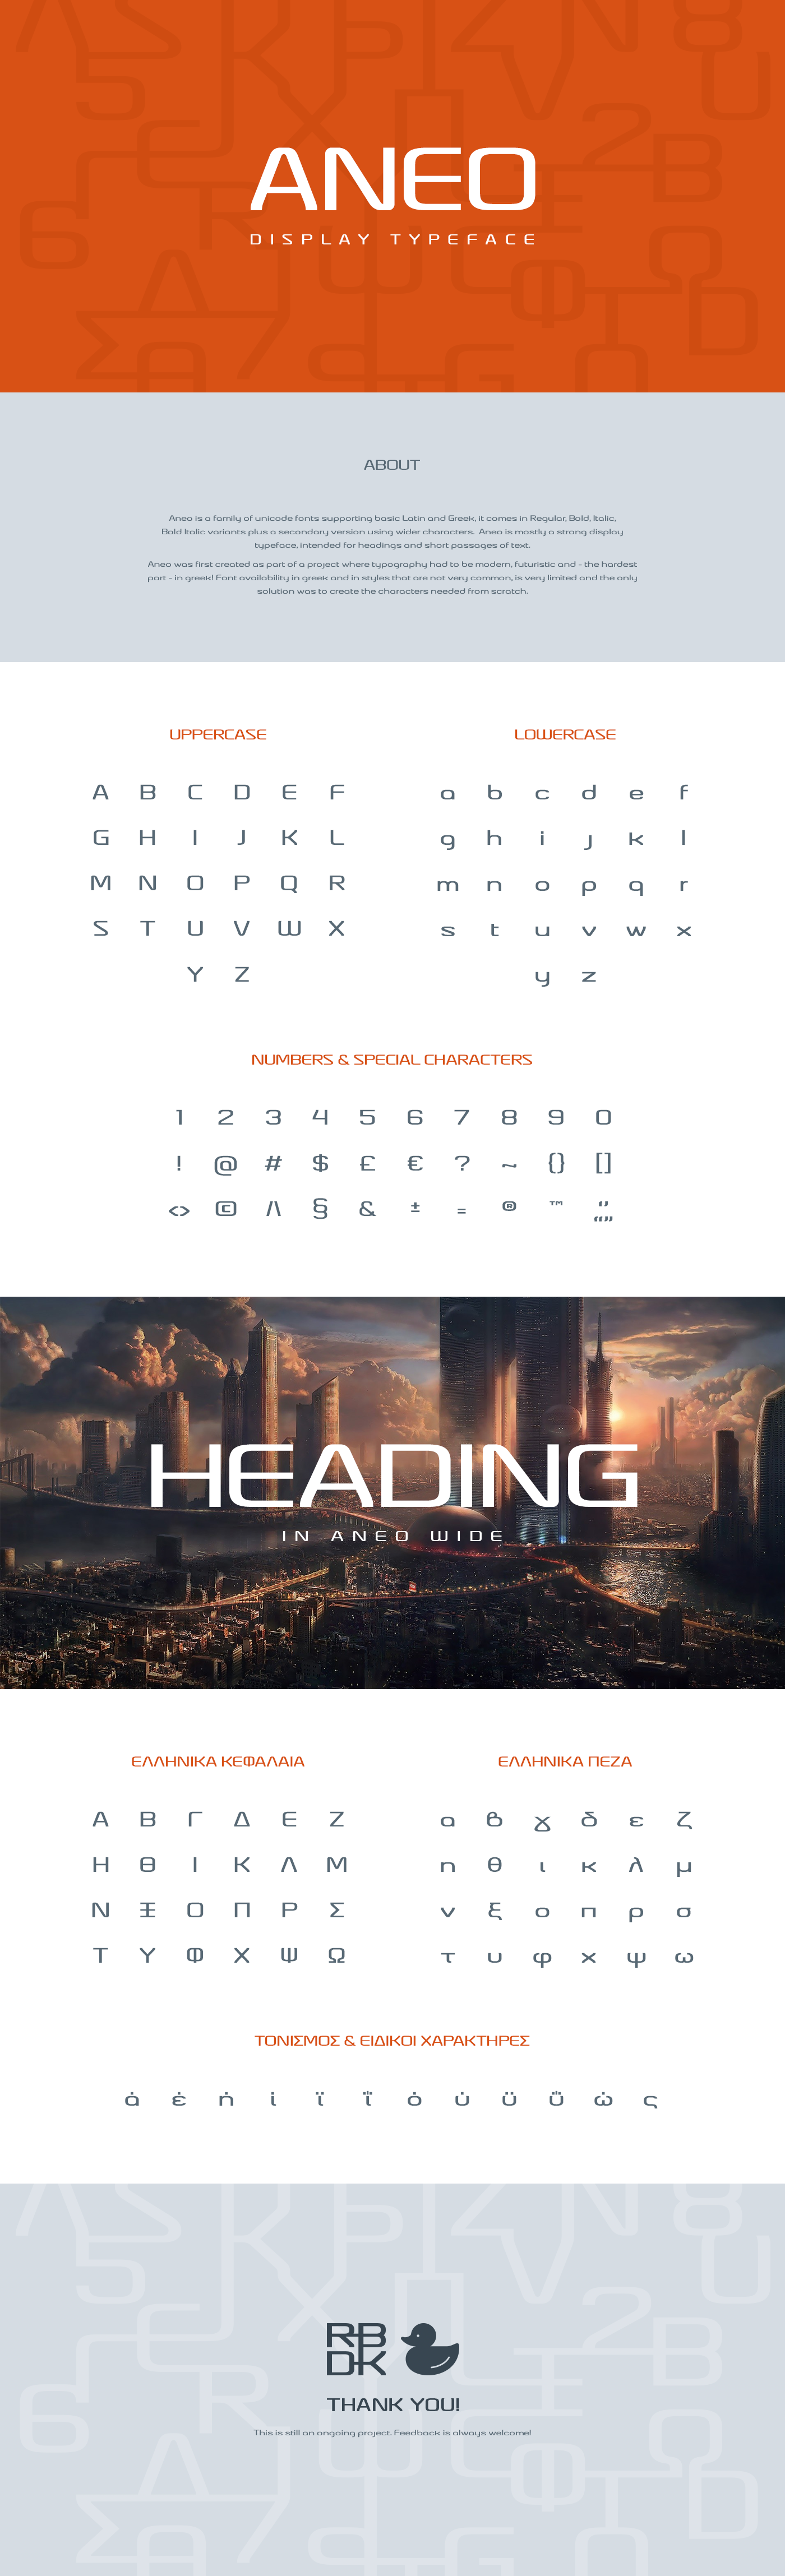 Free font,free fonts,font,Typeface,type,free type,freebie,modern,futuristic,sans serif